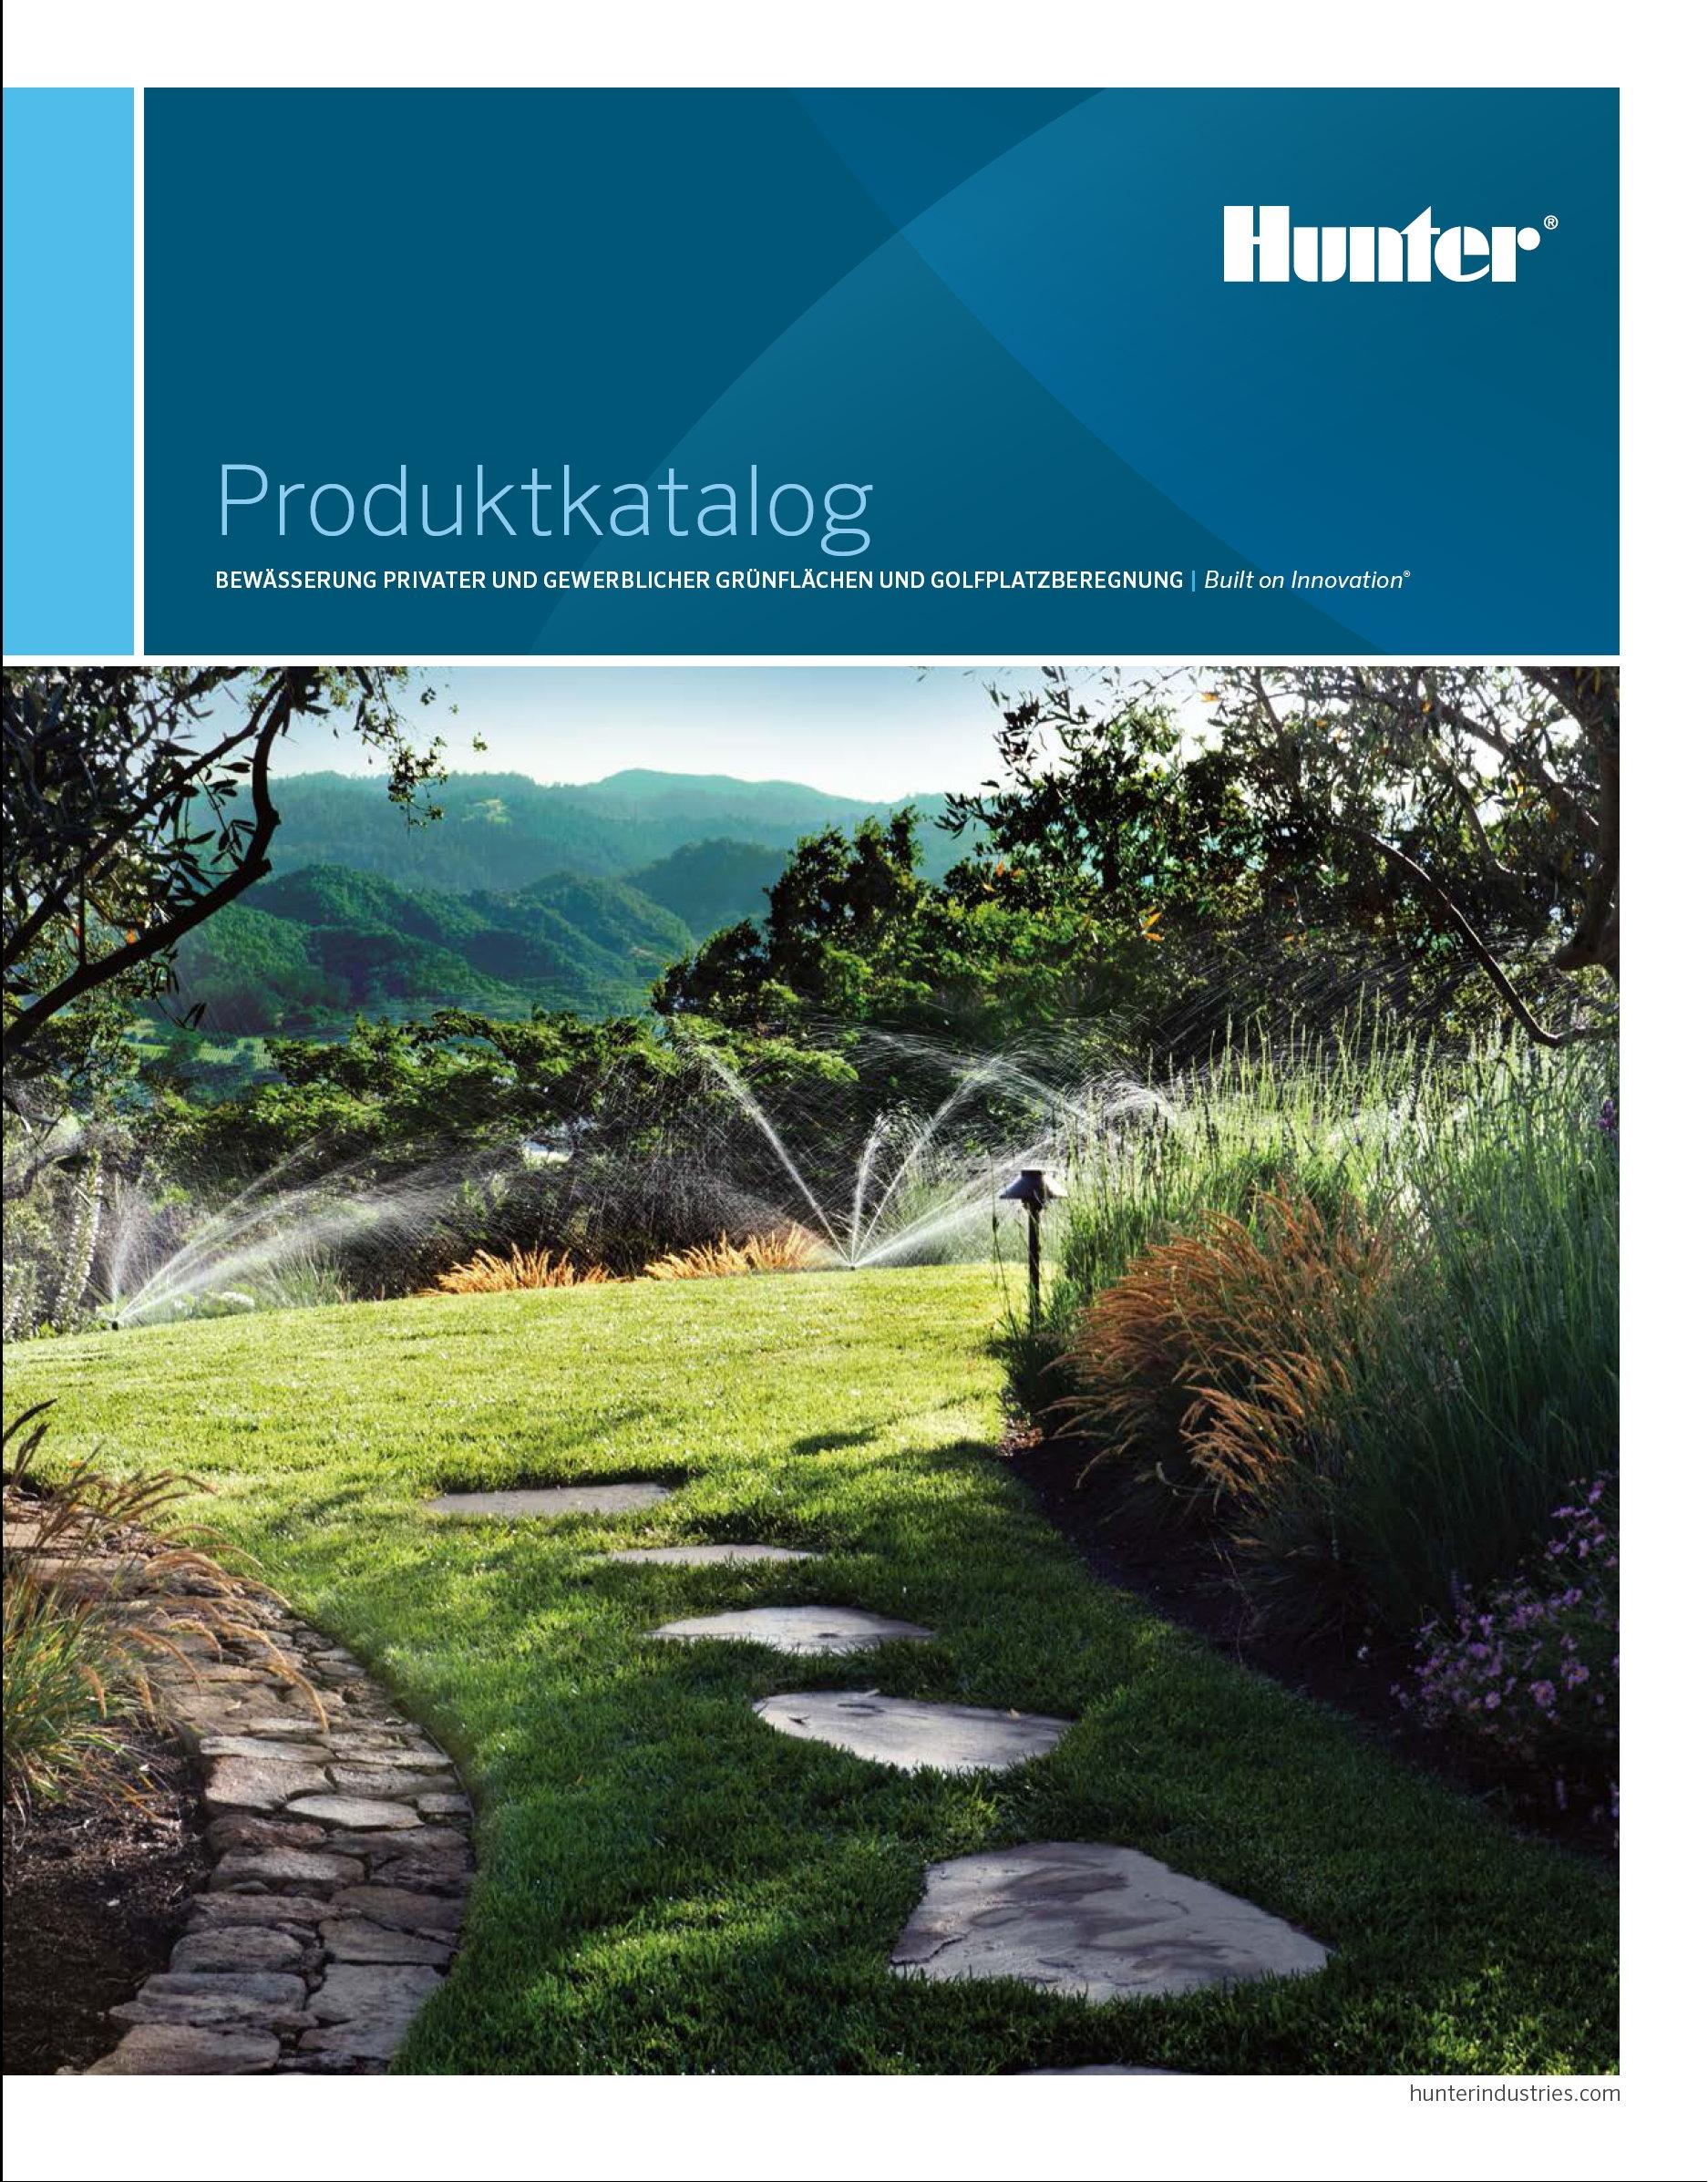 Hunter Katalog 2014 Bewässerung